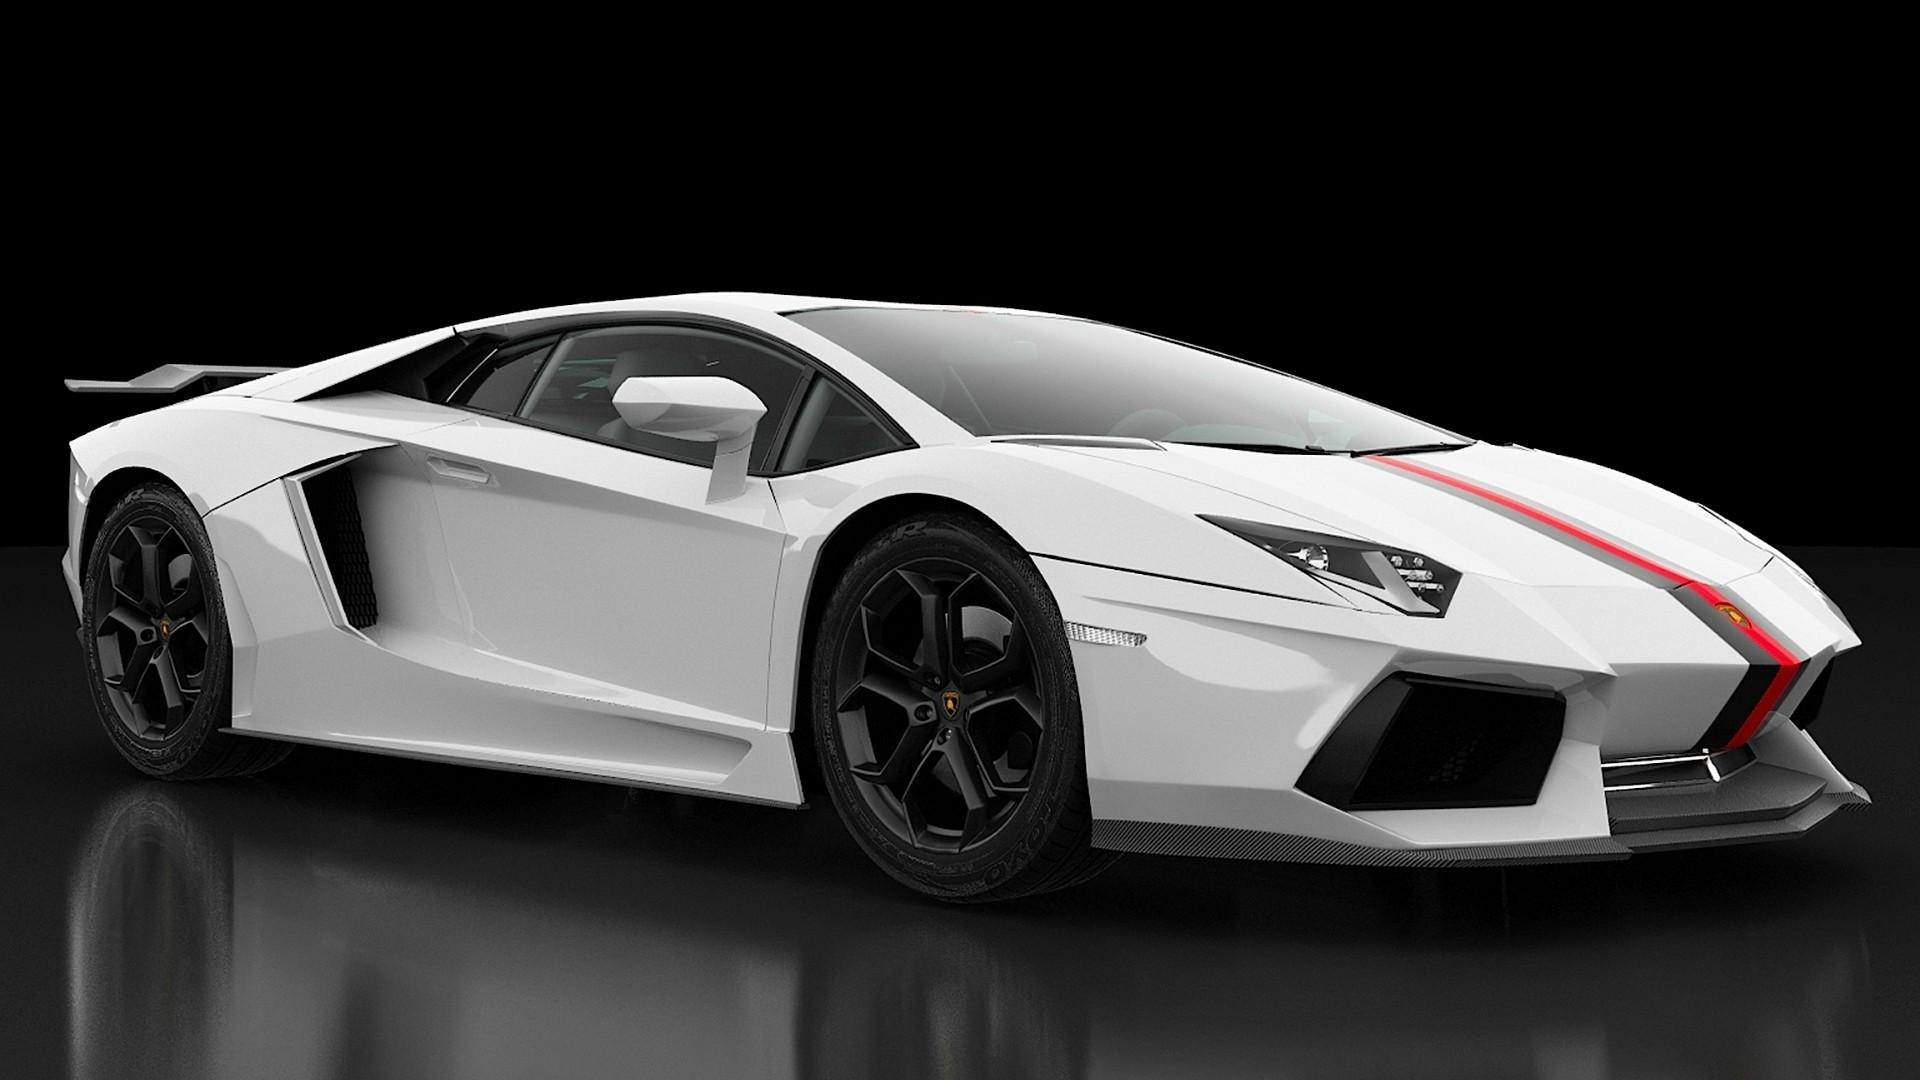 2012 Lamborghini Aventador LP700 4 2 Wallpaper | HD Car ...